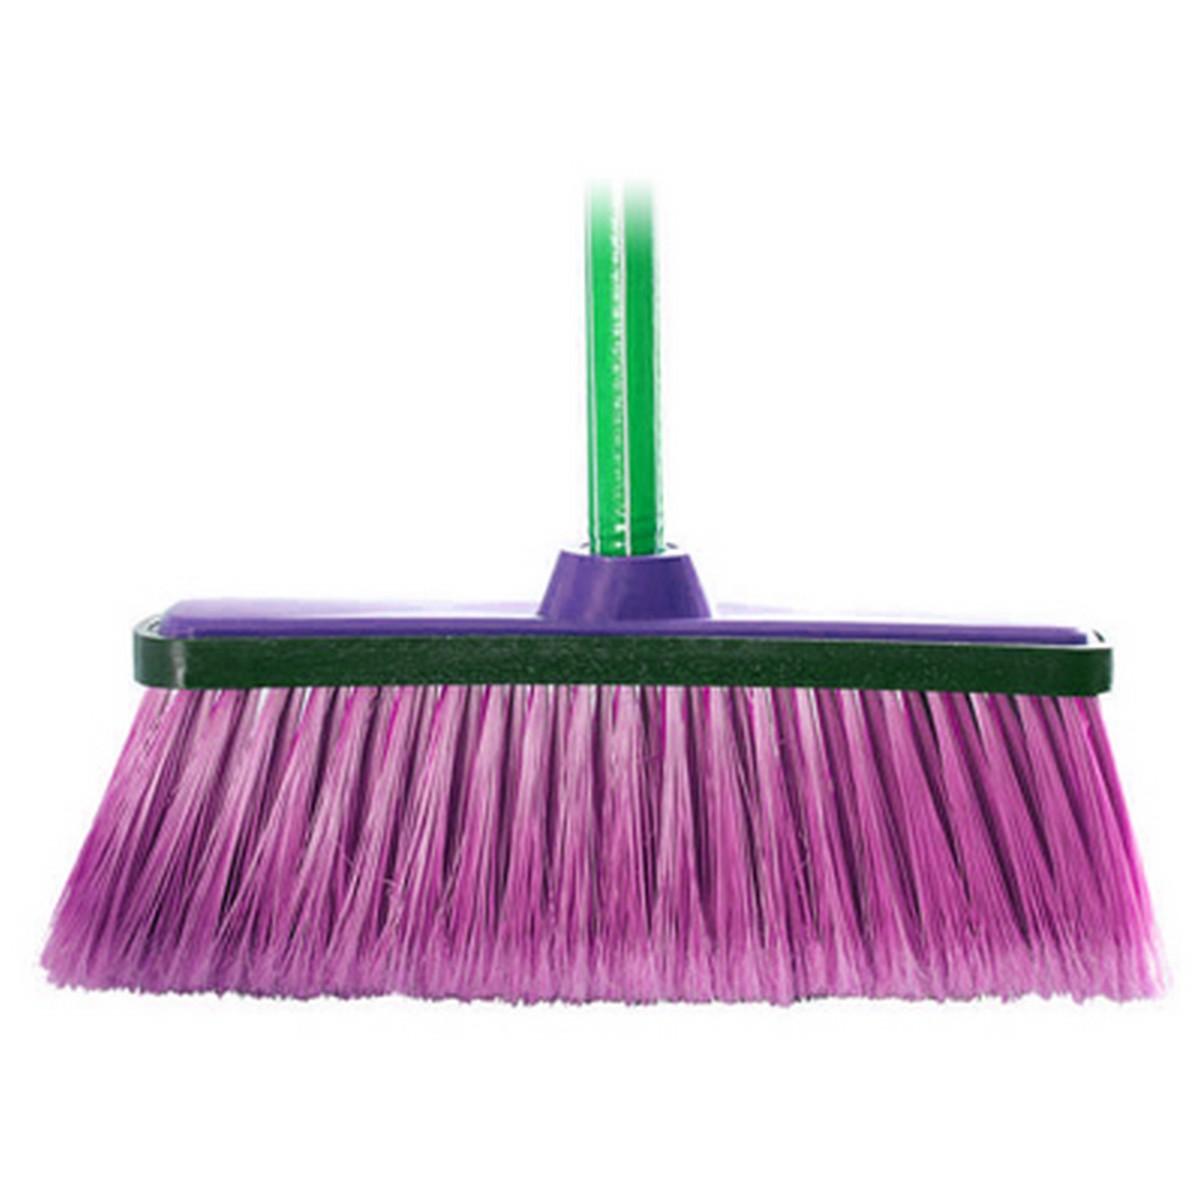 Fornecedores de materiais de limpeza sp